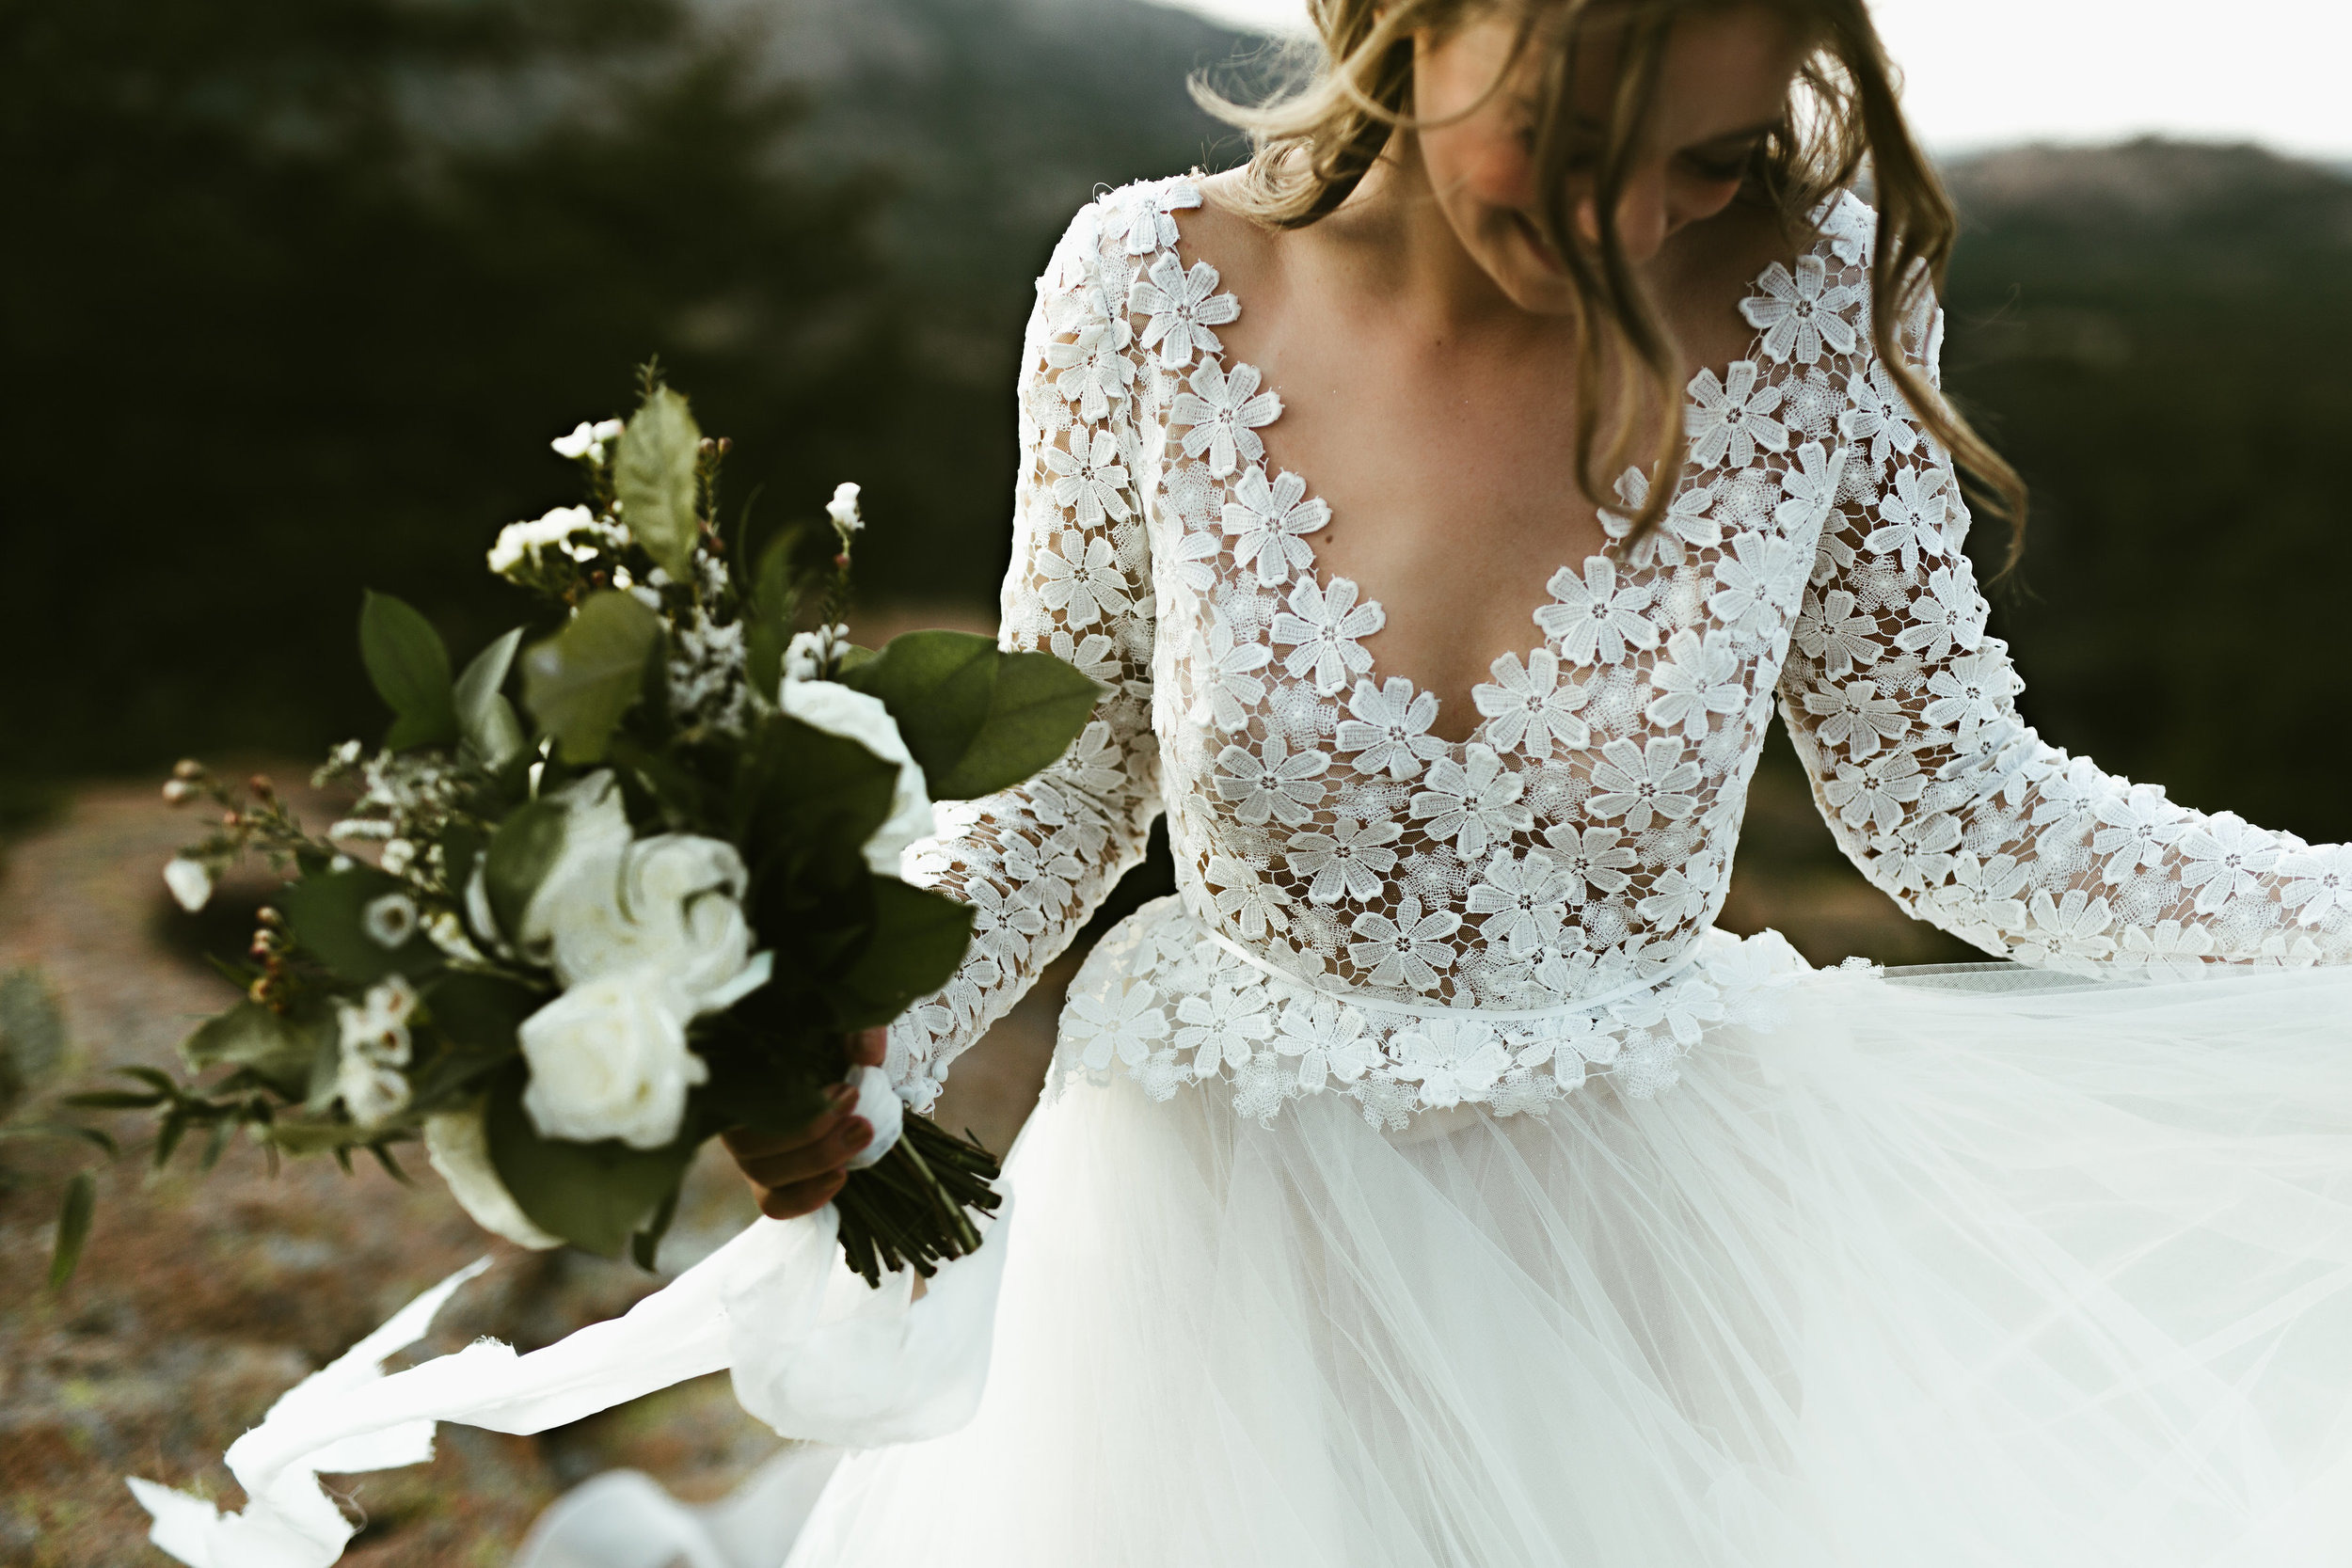 Prescott Bridal | Oklahoma City Wedding Dresses and Gowns - Hailey Faria Styled Shoot